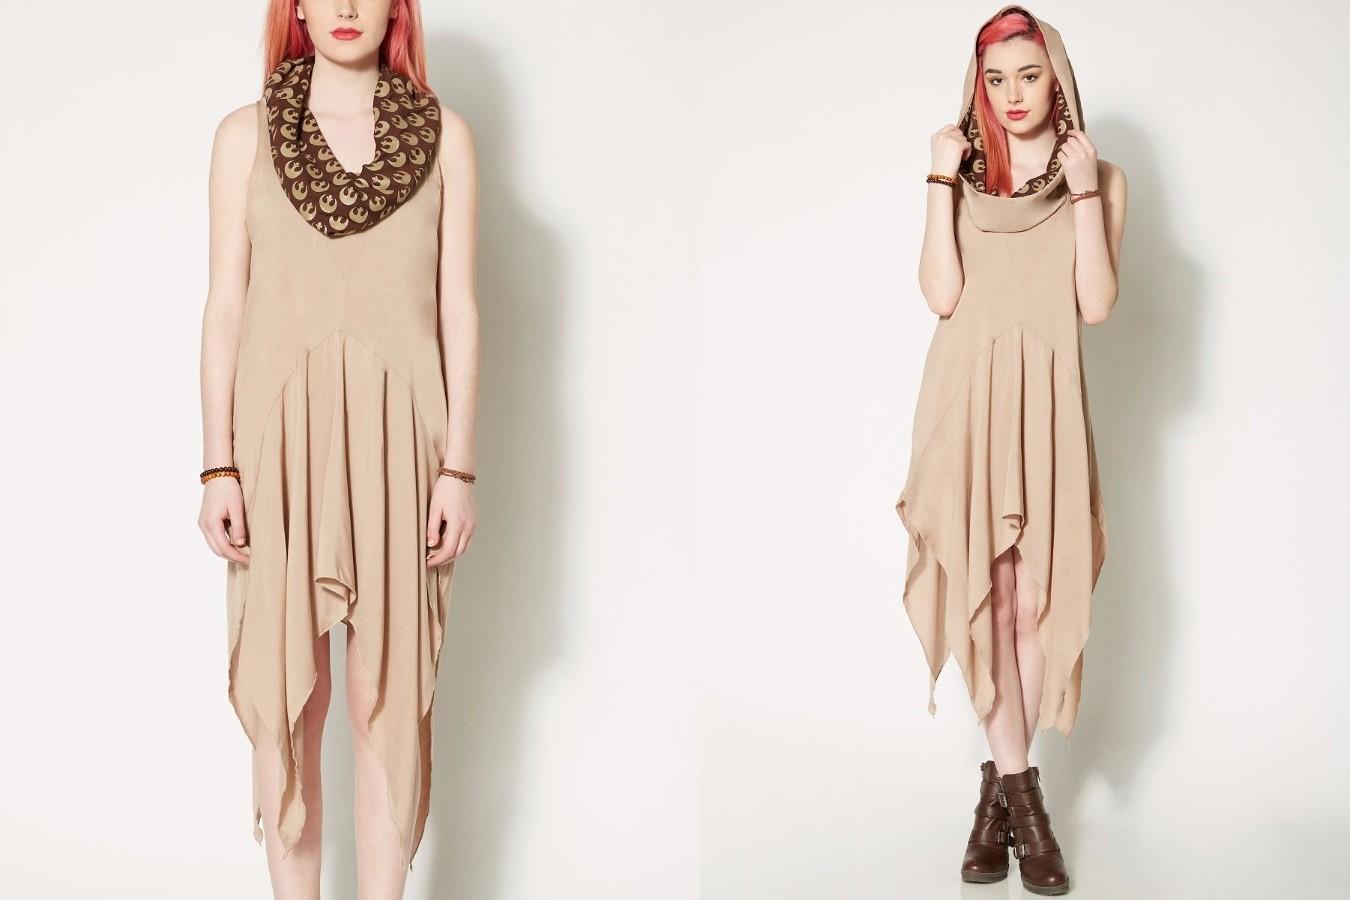 We Love Fine hooded Rey dress at Spencers